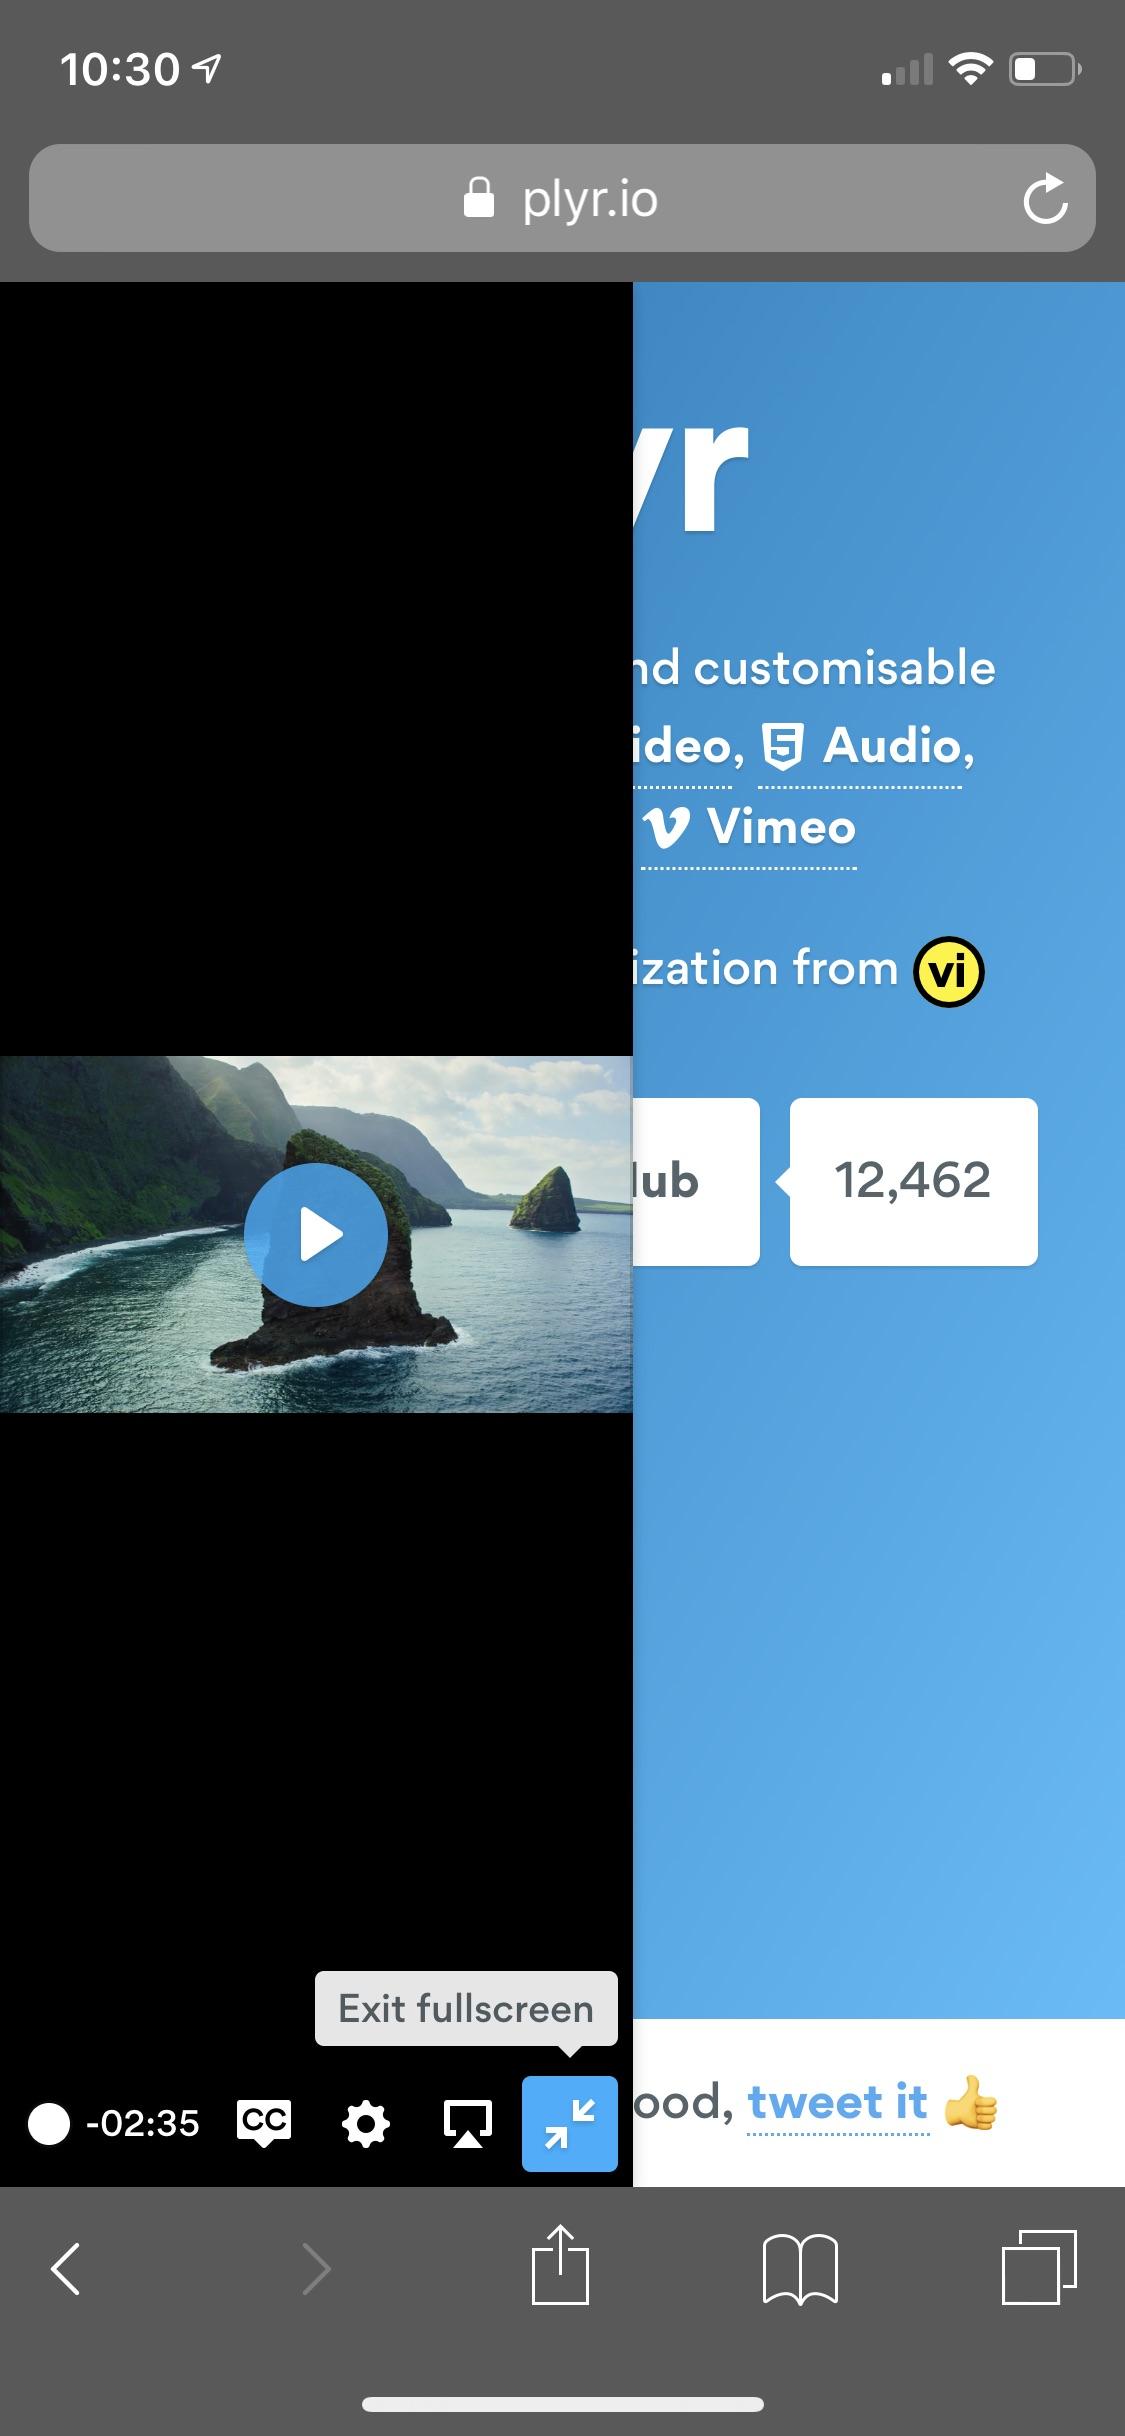 Vimeo fullscreen issues in Safari · Issue #1266 · sampotts